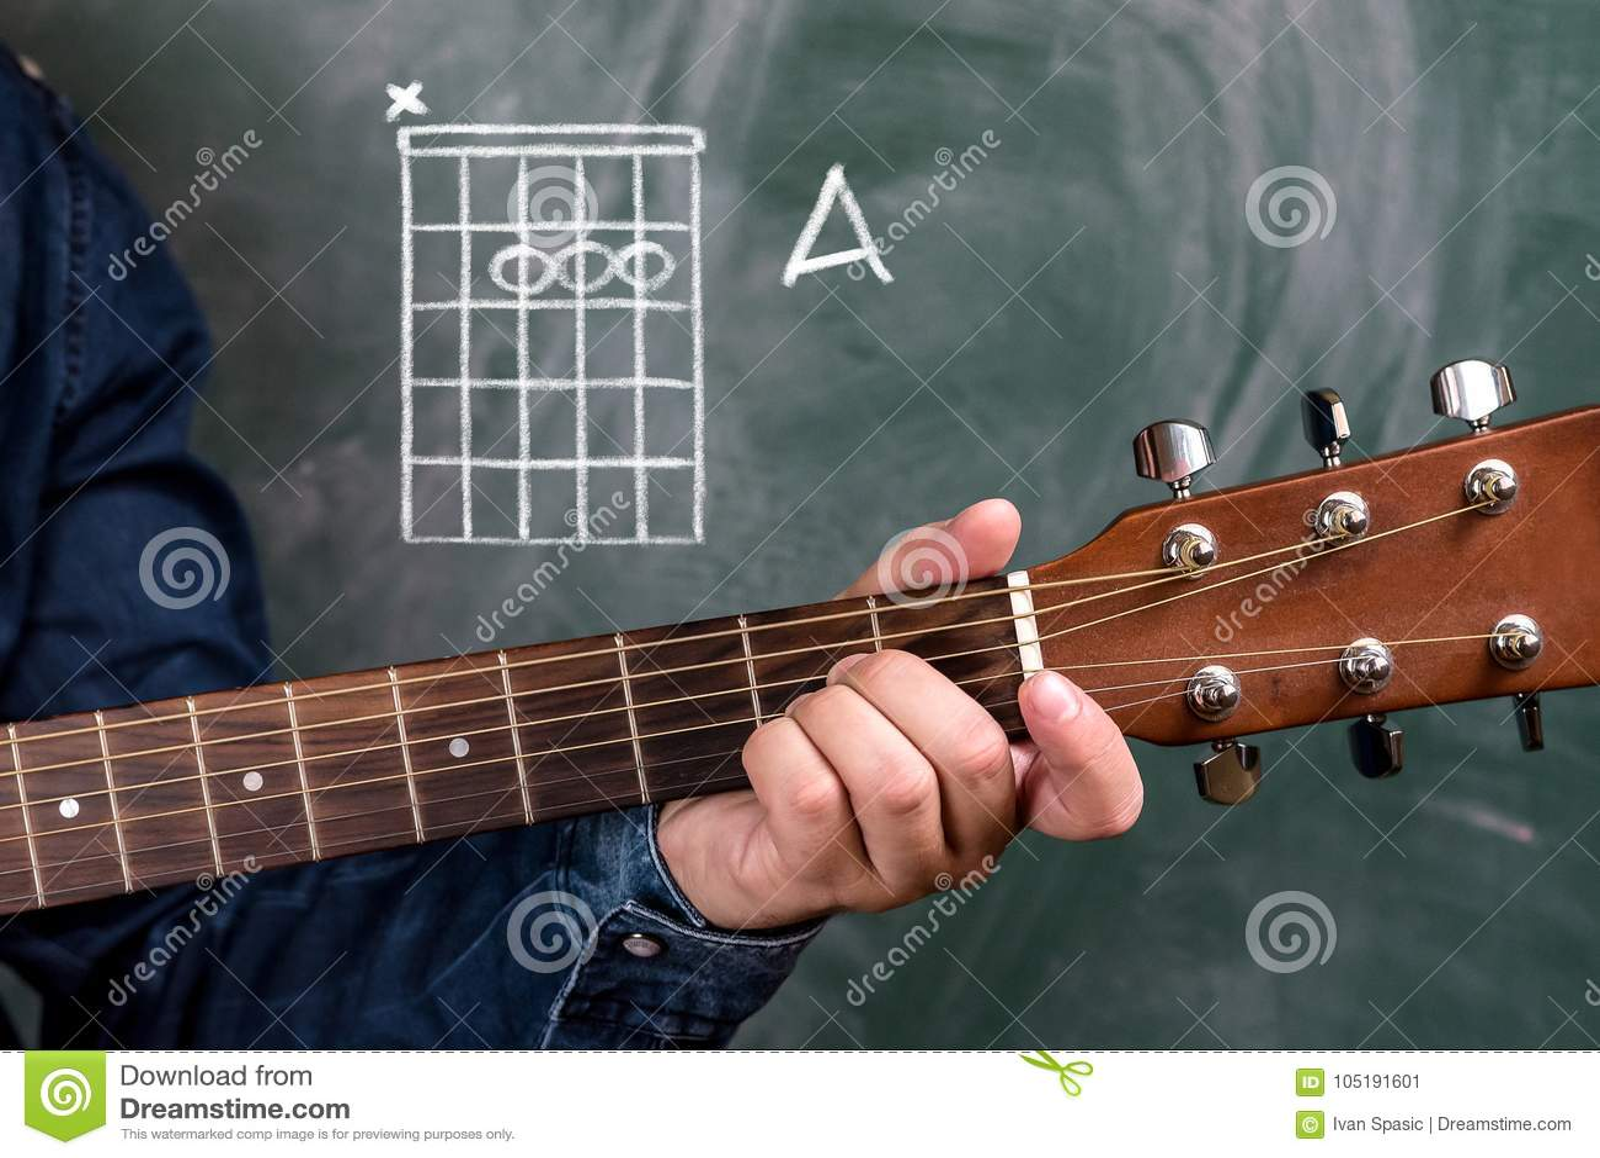 Man Playing Guitar Chords Displayed On A Blackboard Chord A Stock